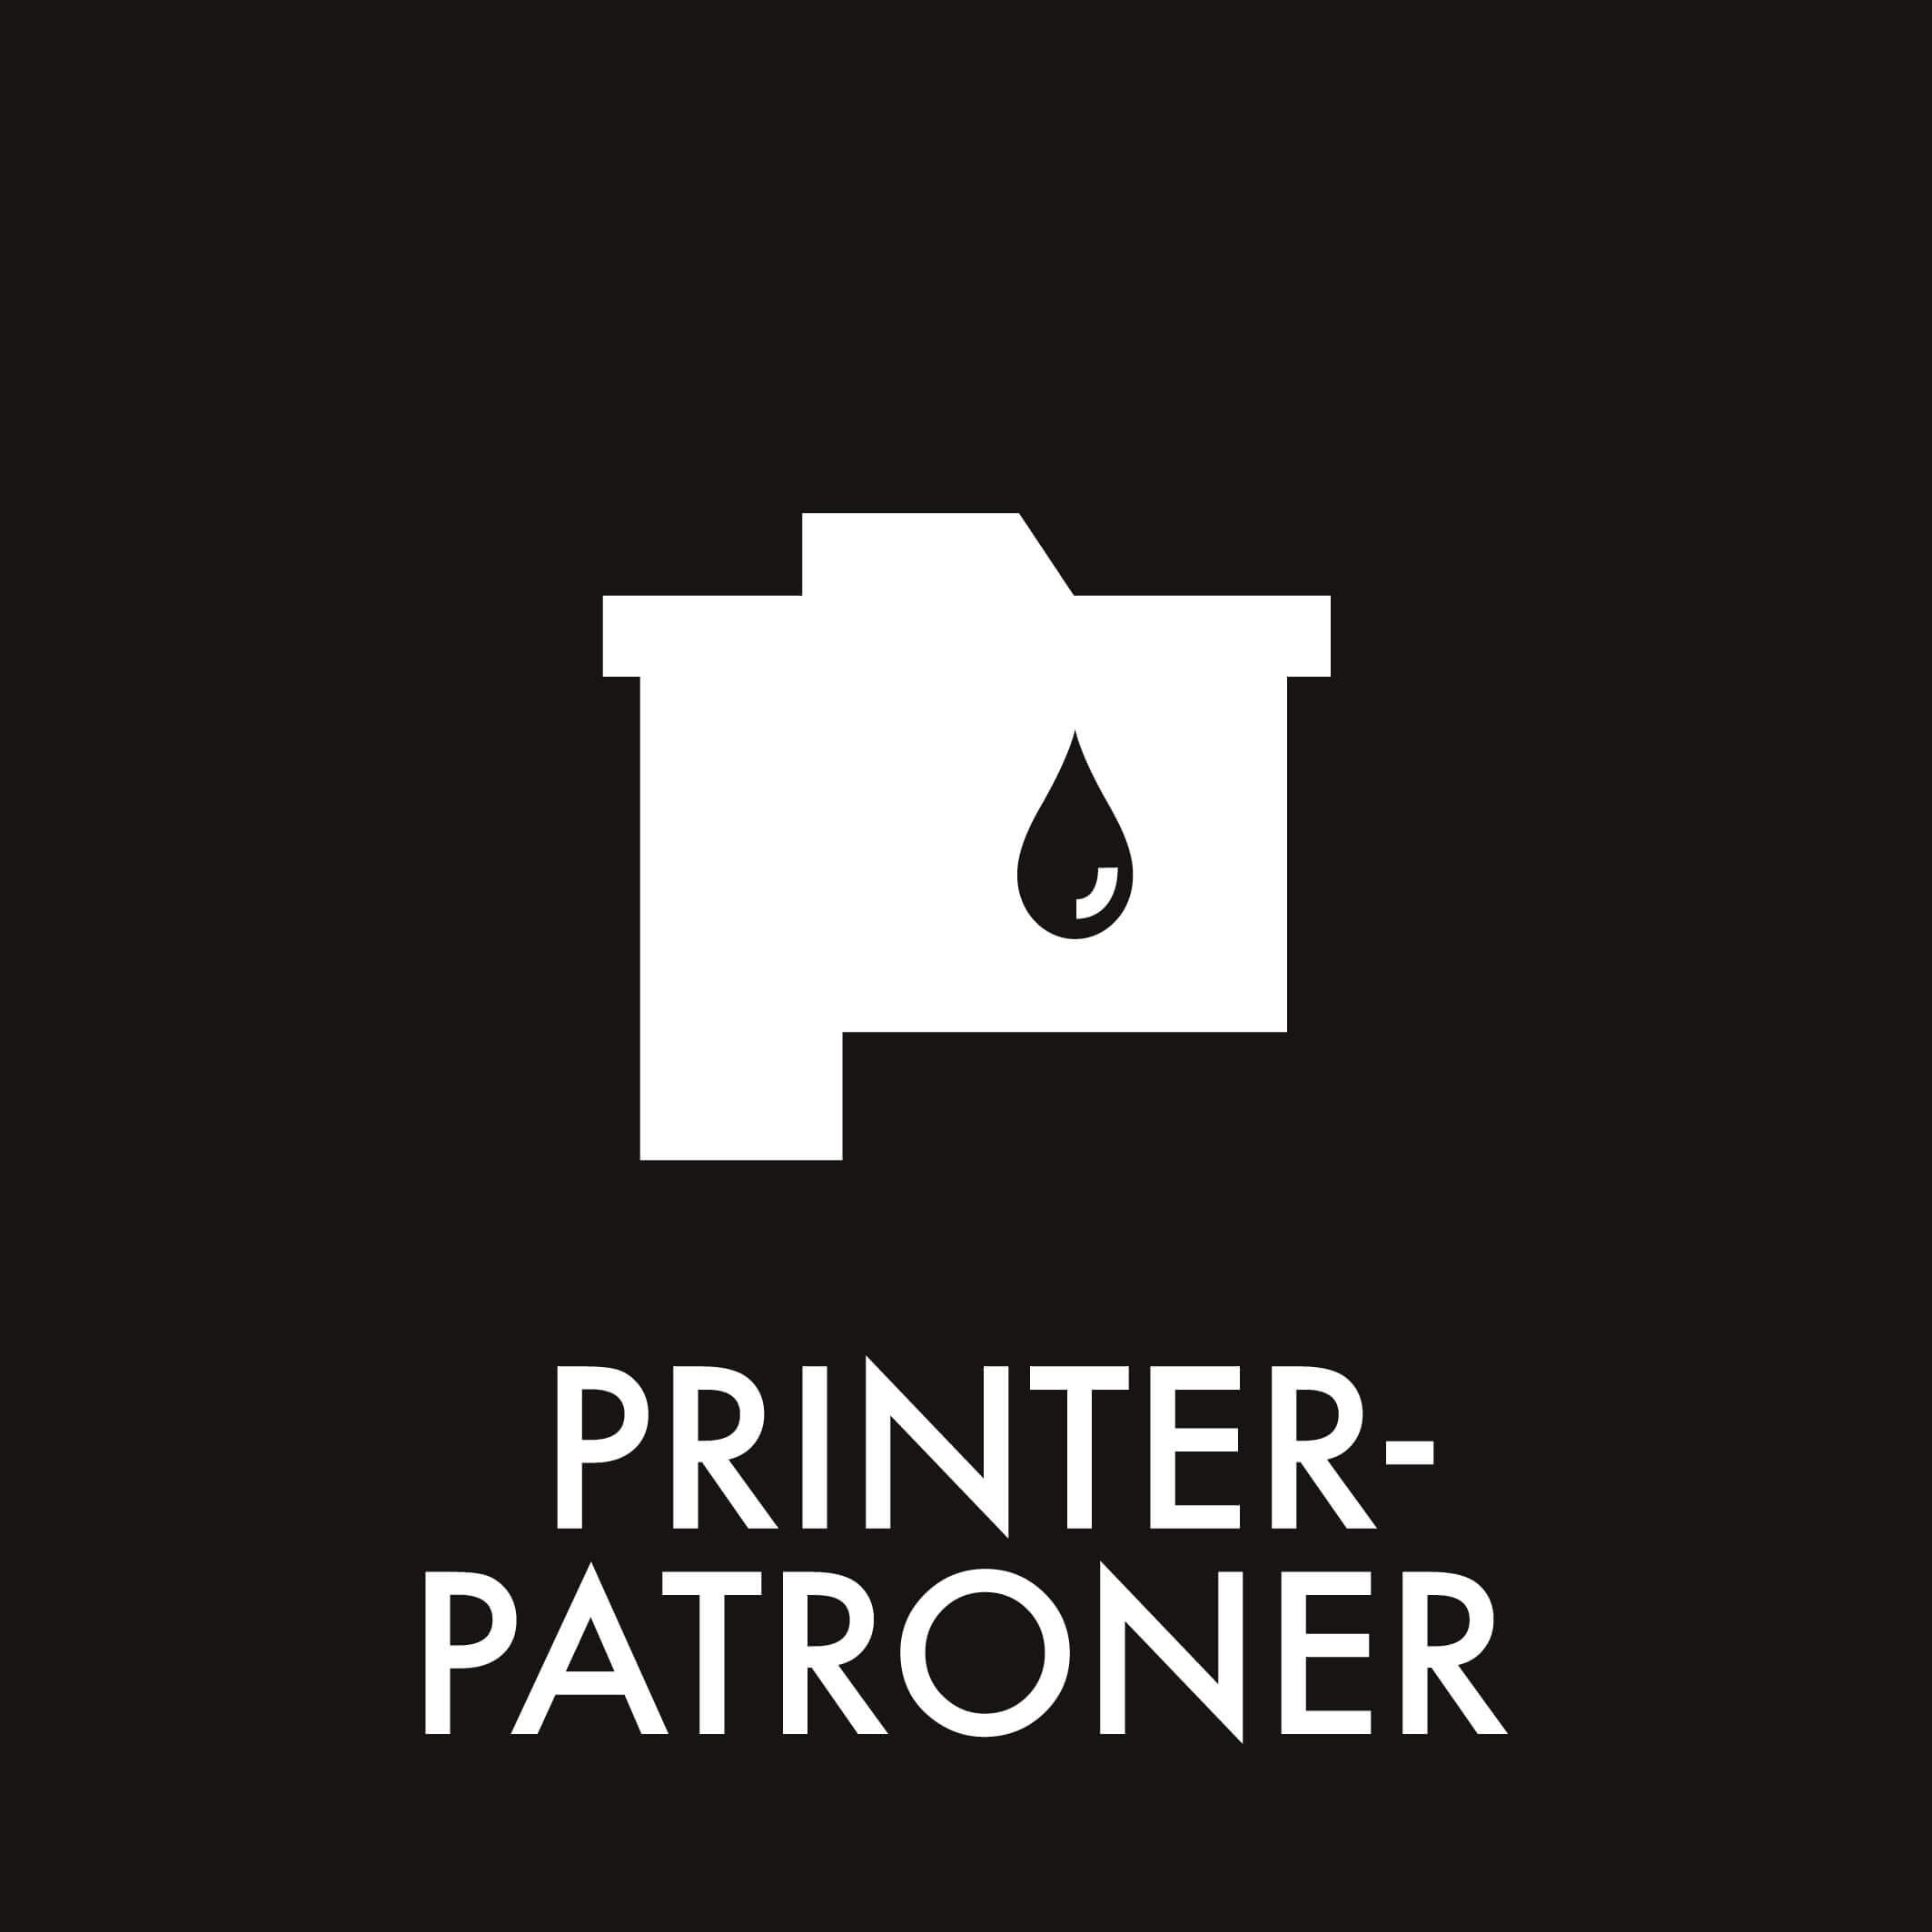 Dansk Affaldssortering - Printerpatroner sort